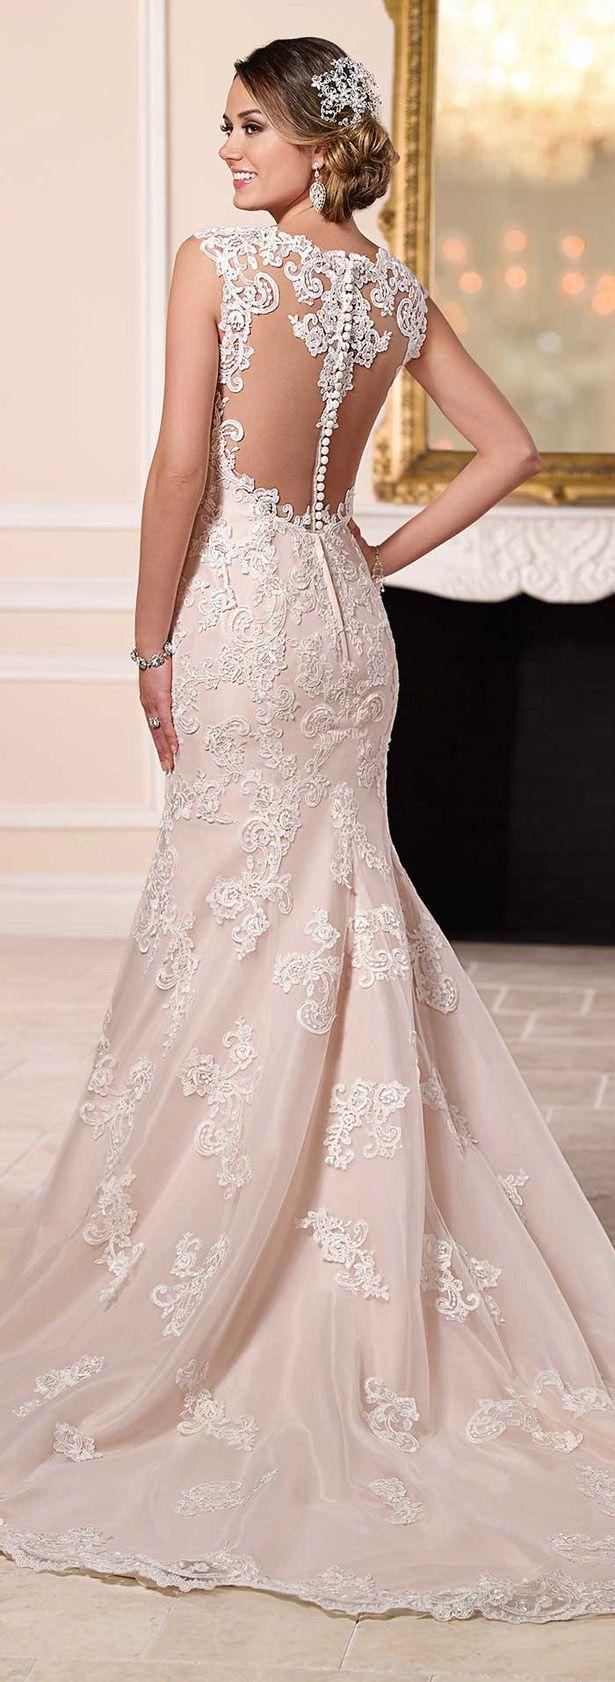 blush wedding dresses blush colored wedding dresses Stella York Spring Bridal Collection Blush Colored Wedding DressStella